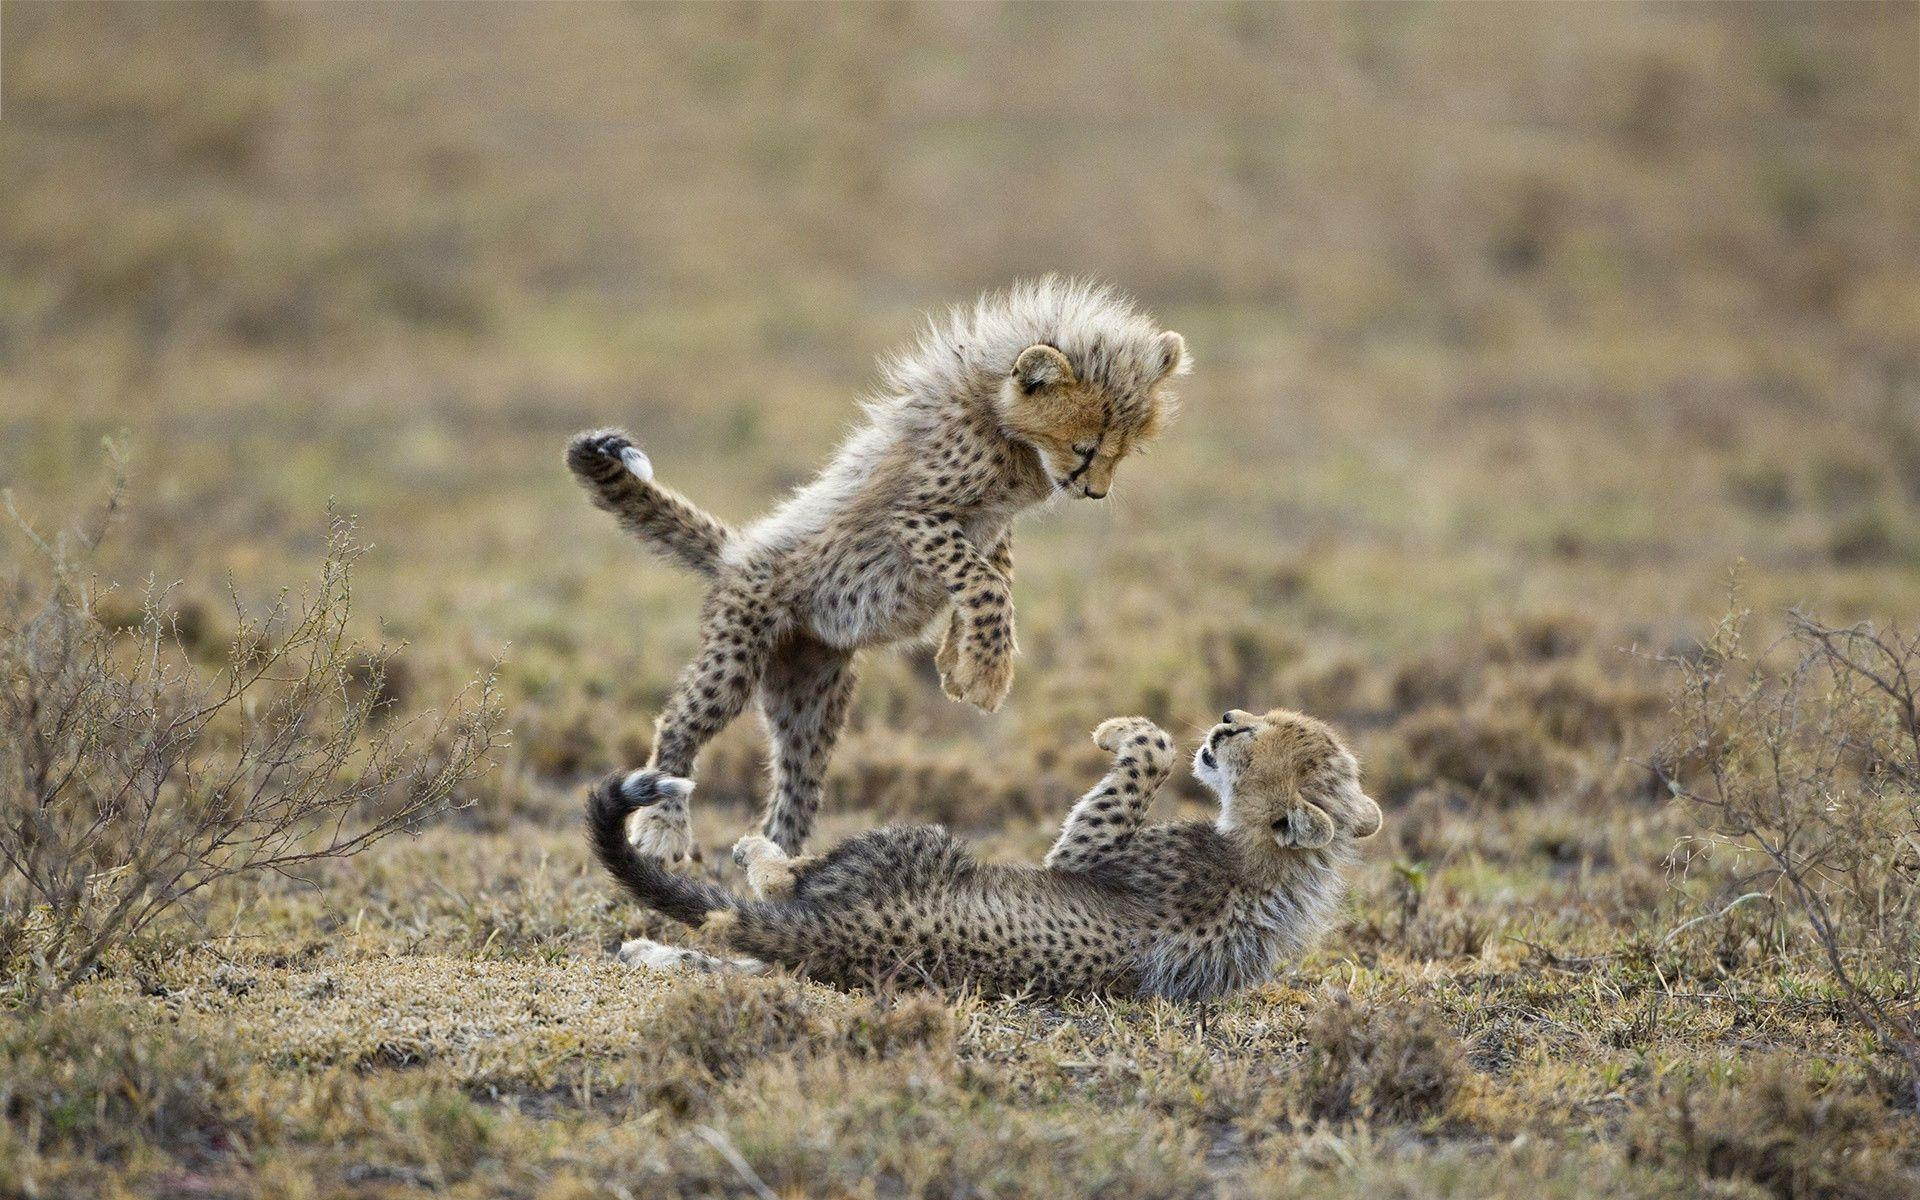 Cute Lion Cubs Hd Wallpapers Cute Cheetah Wallpapers Wallpaper Cave